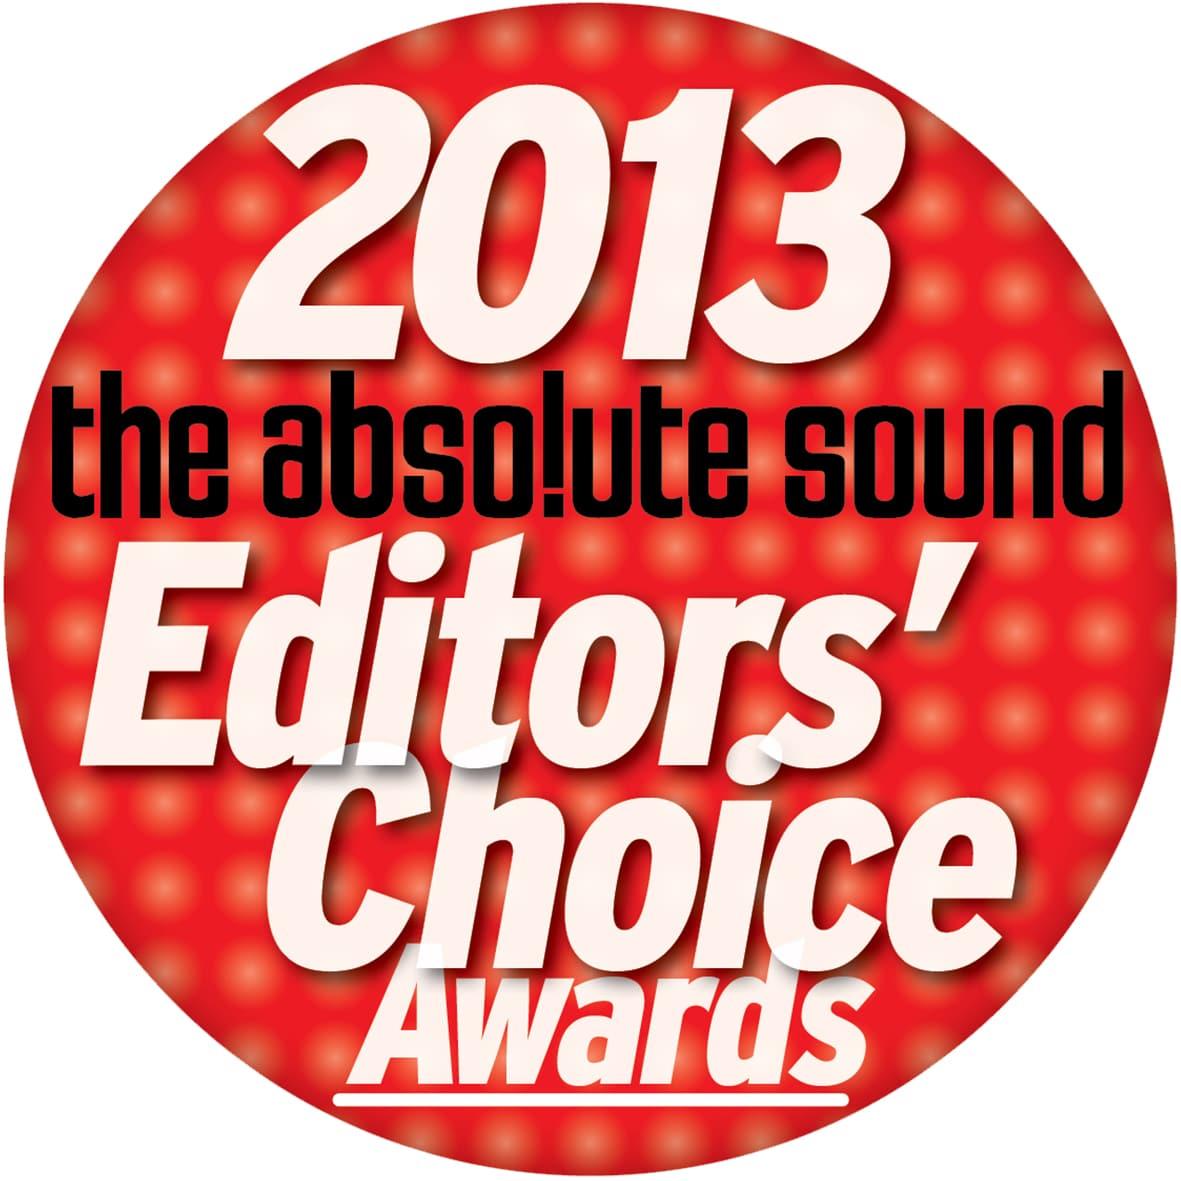 Editors choice award for S-15